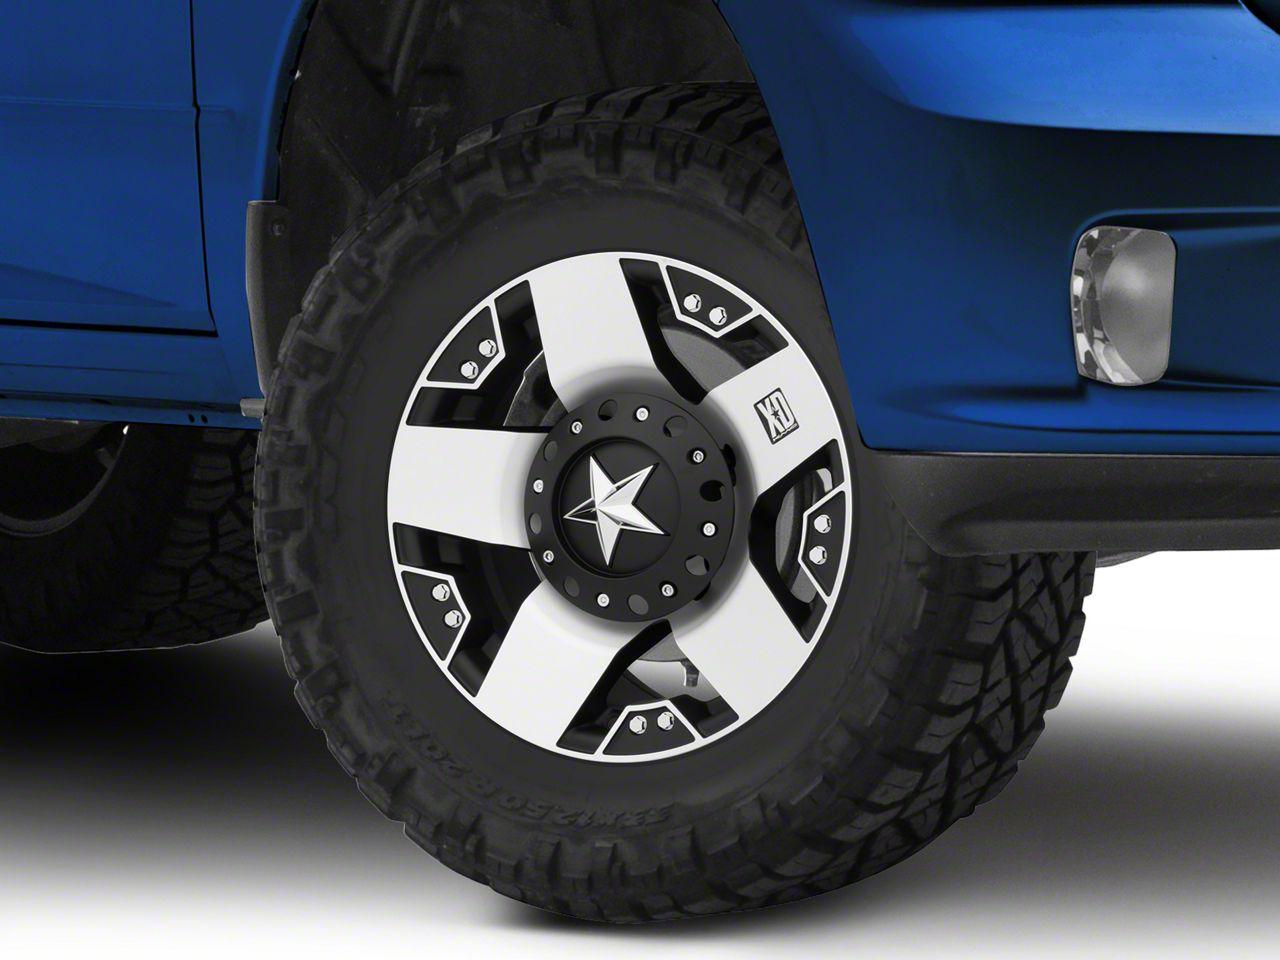 Rockstar XD775 Black Machined 5-Lug Wheel - 17x9 (02-18 RAM 1500, Excluding Mega Cab)